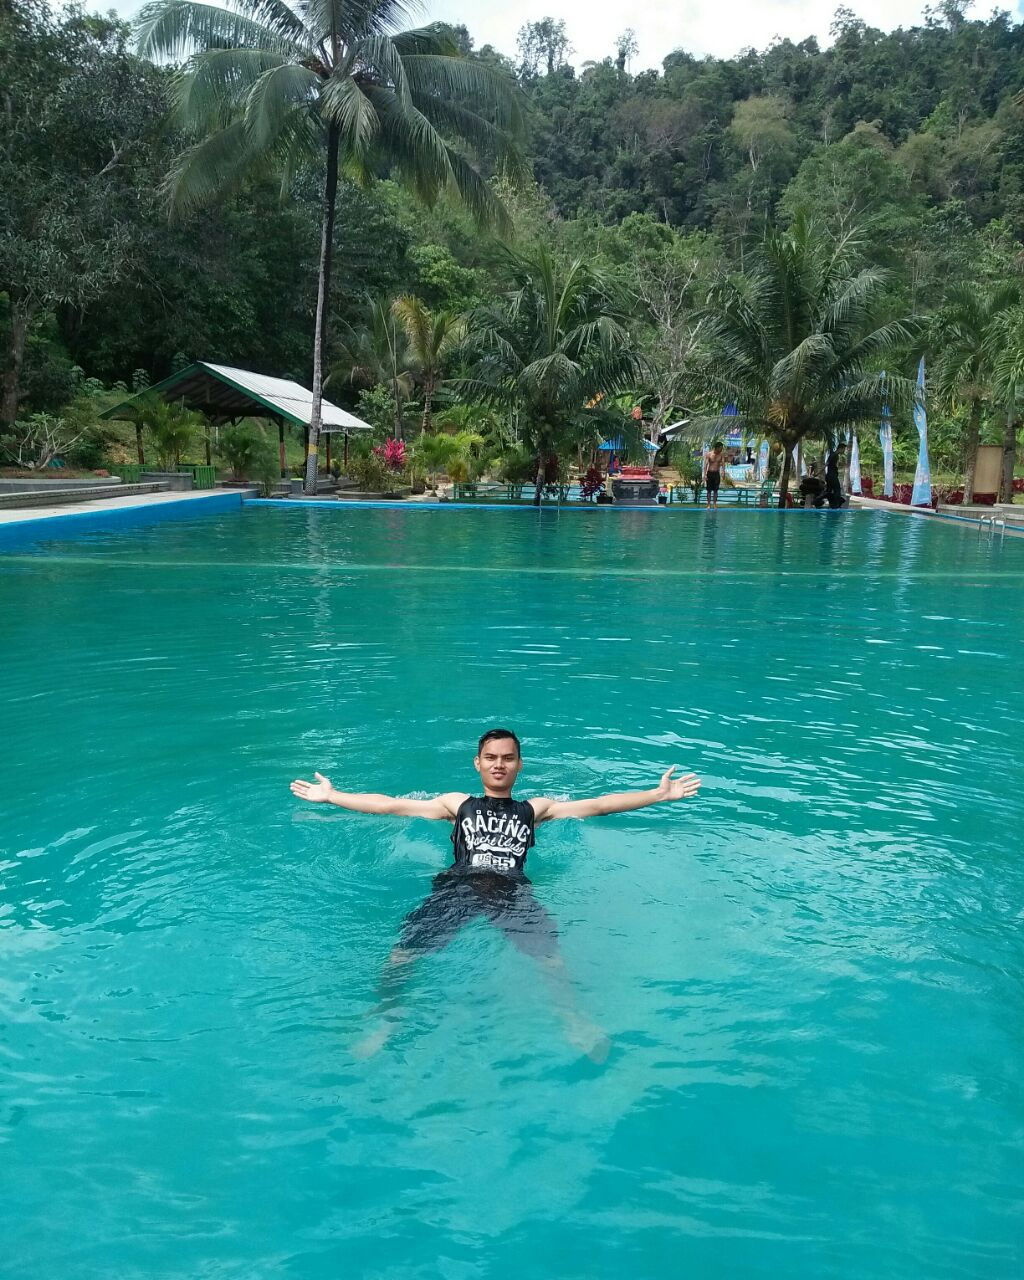 Inilah Kolam Renang Kelapa Gading Pulau Buton Wisata Pemandian Air Jernih Denianggoleta